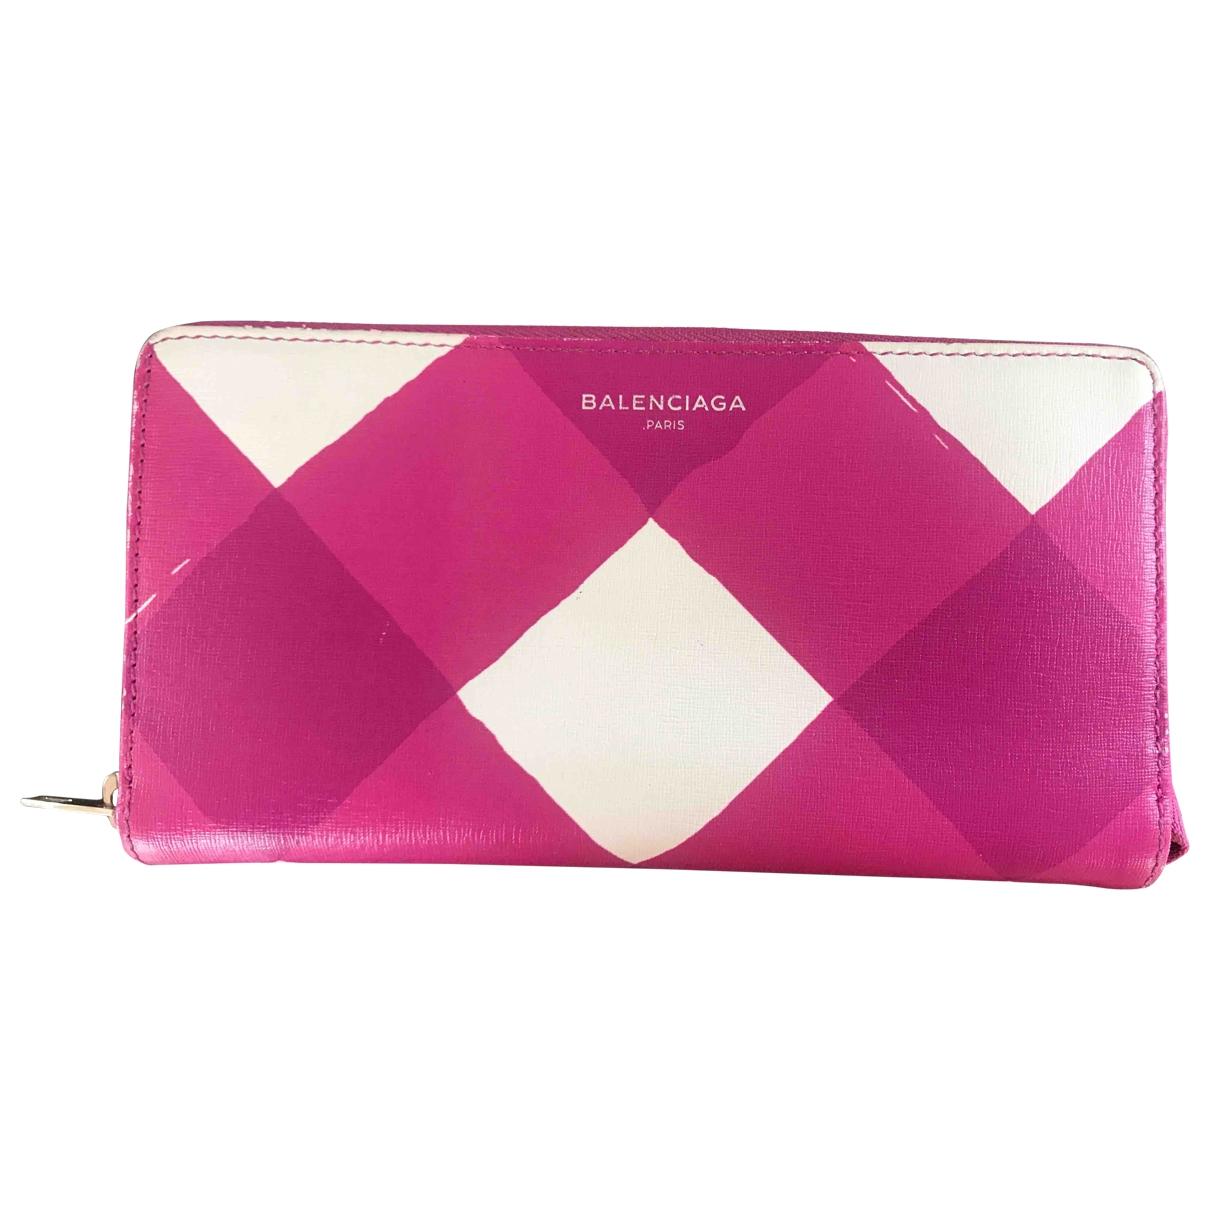 Balenciaga \N Pink Leather wallet for Women \N